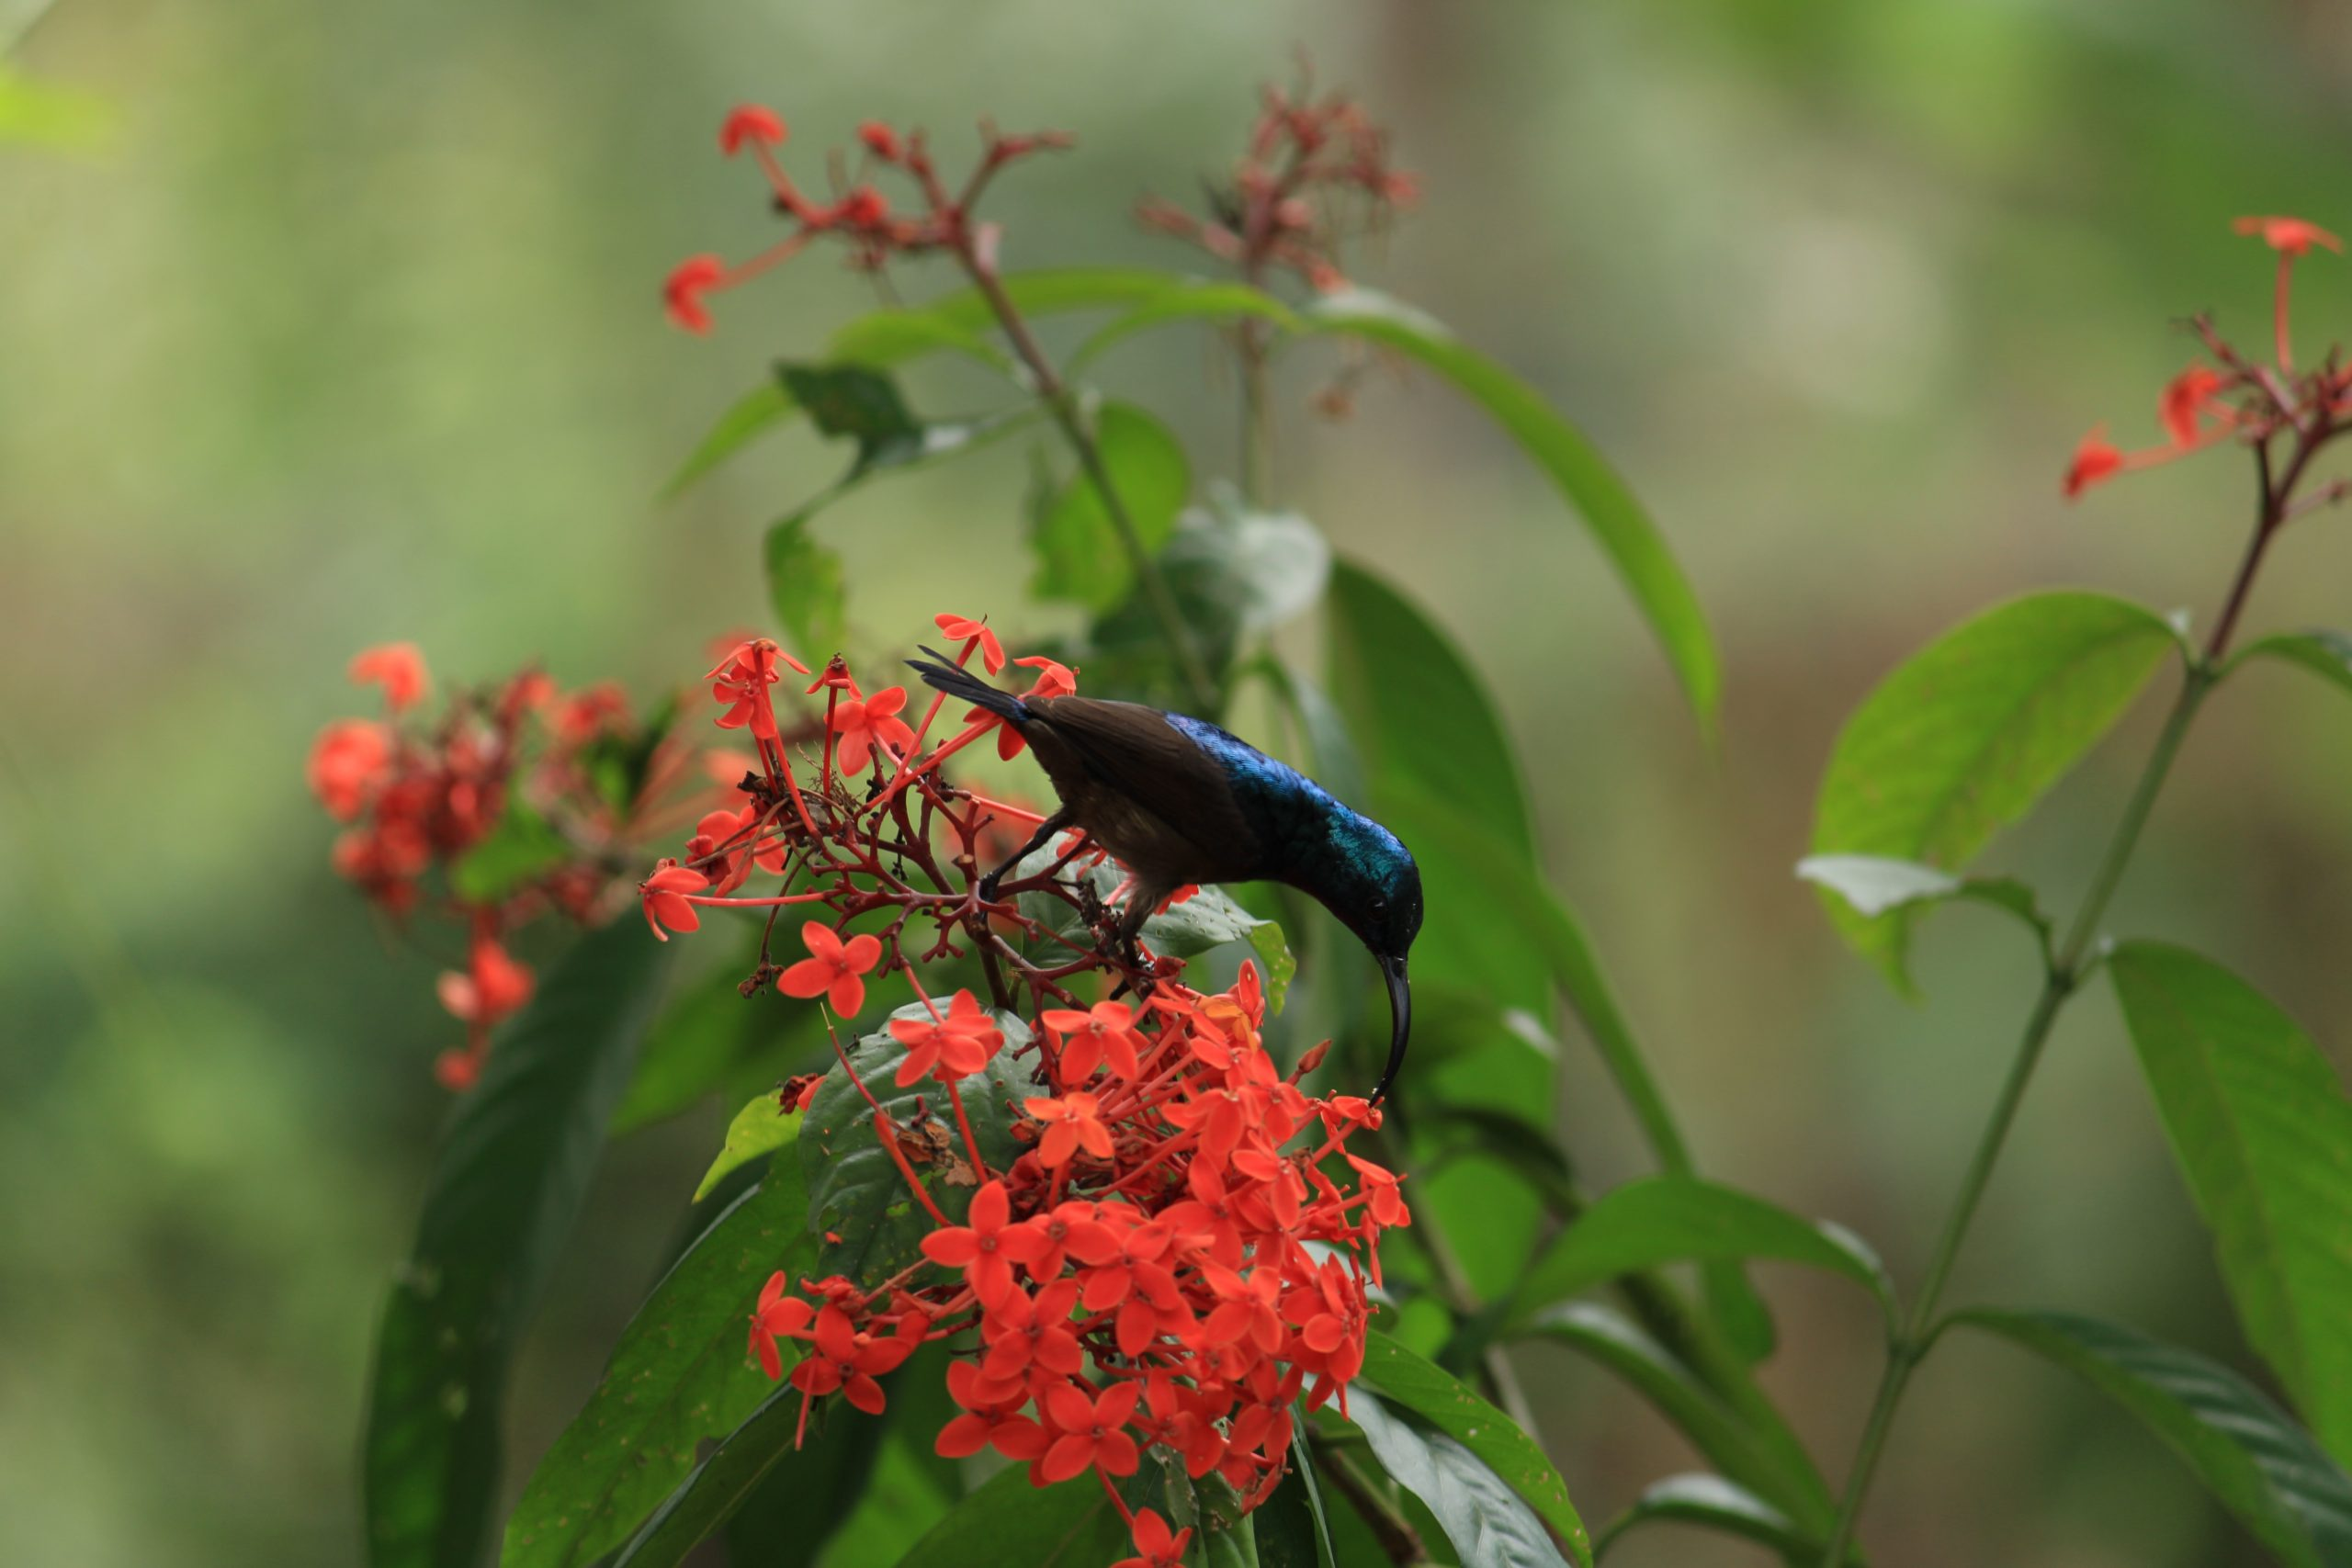 A bird sitting on flower